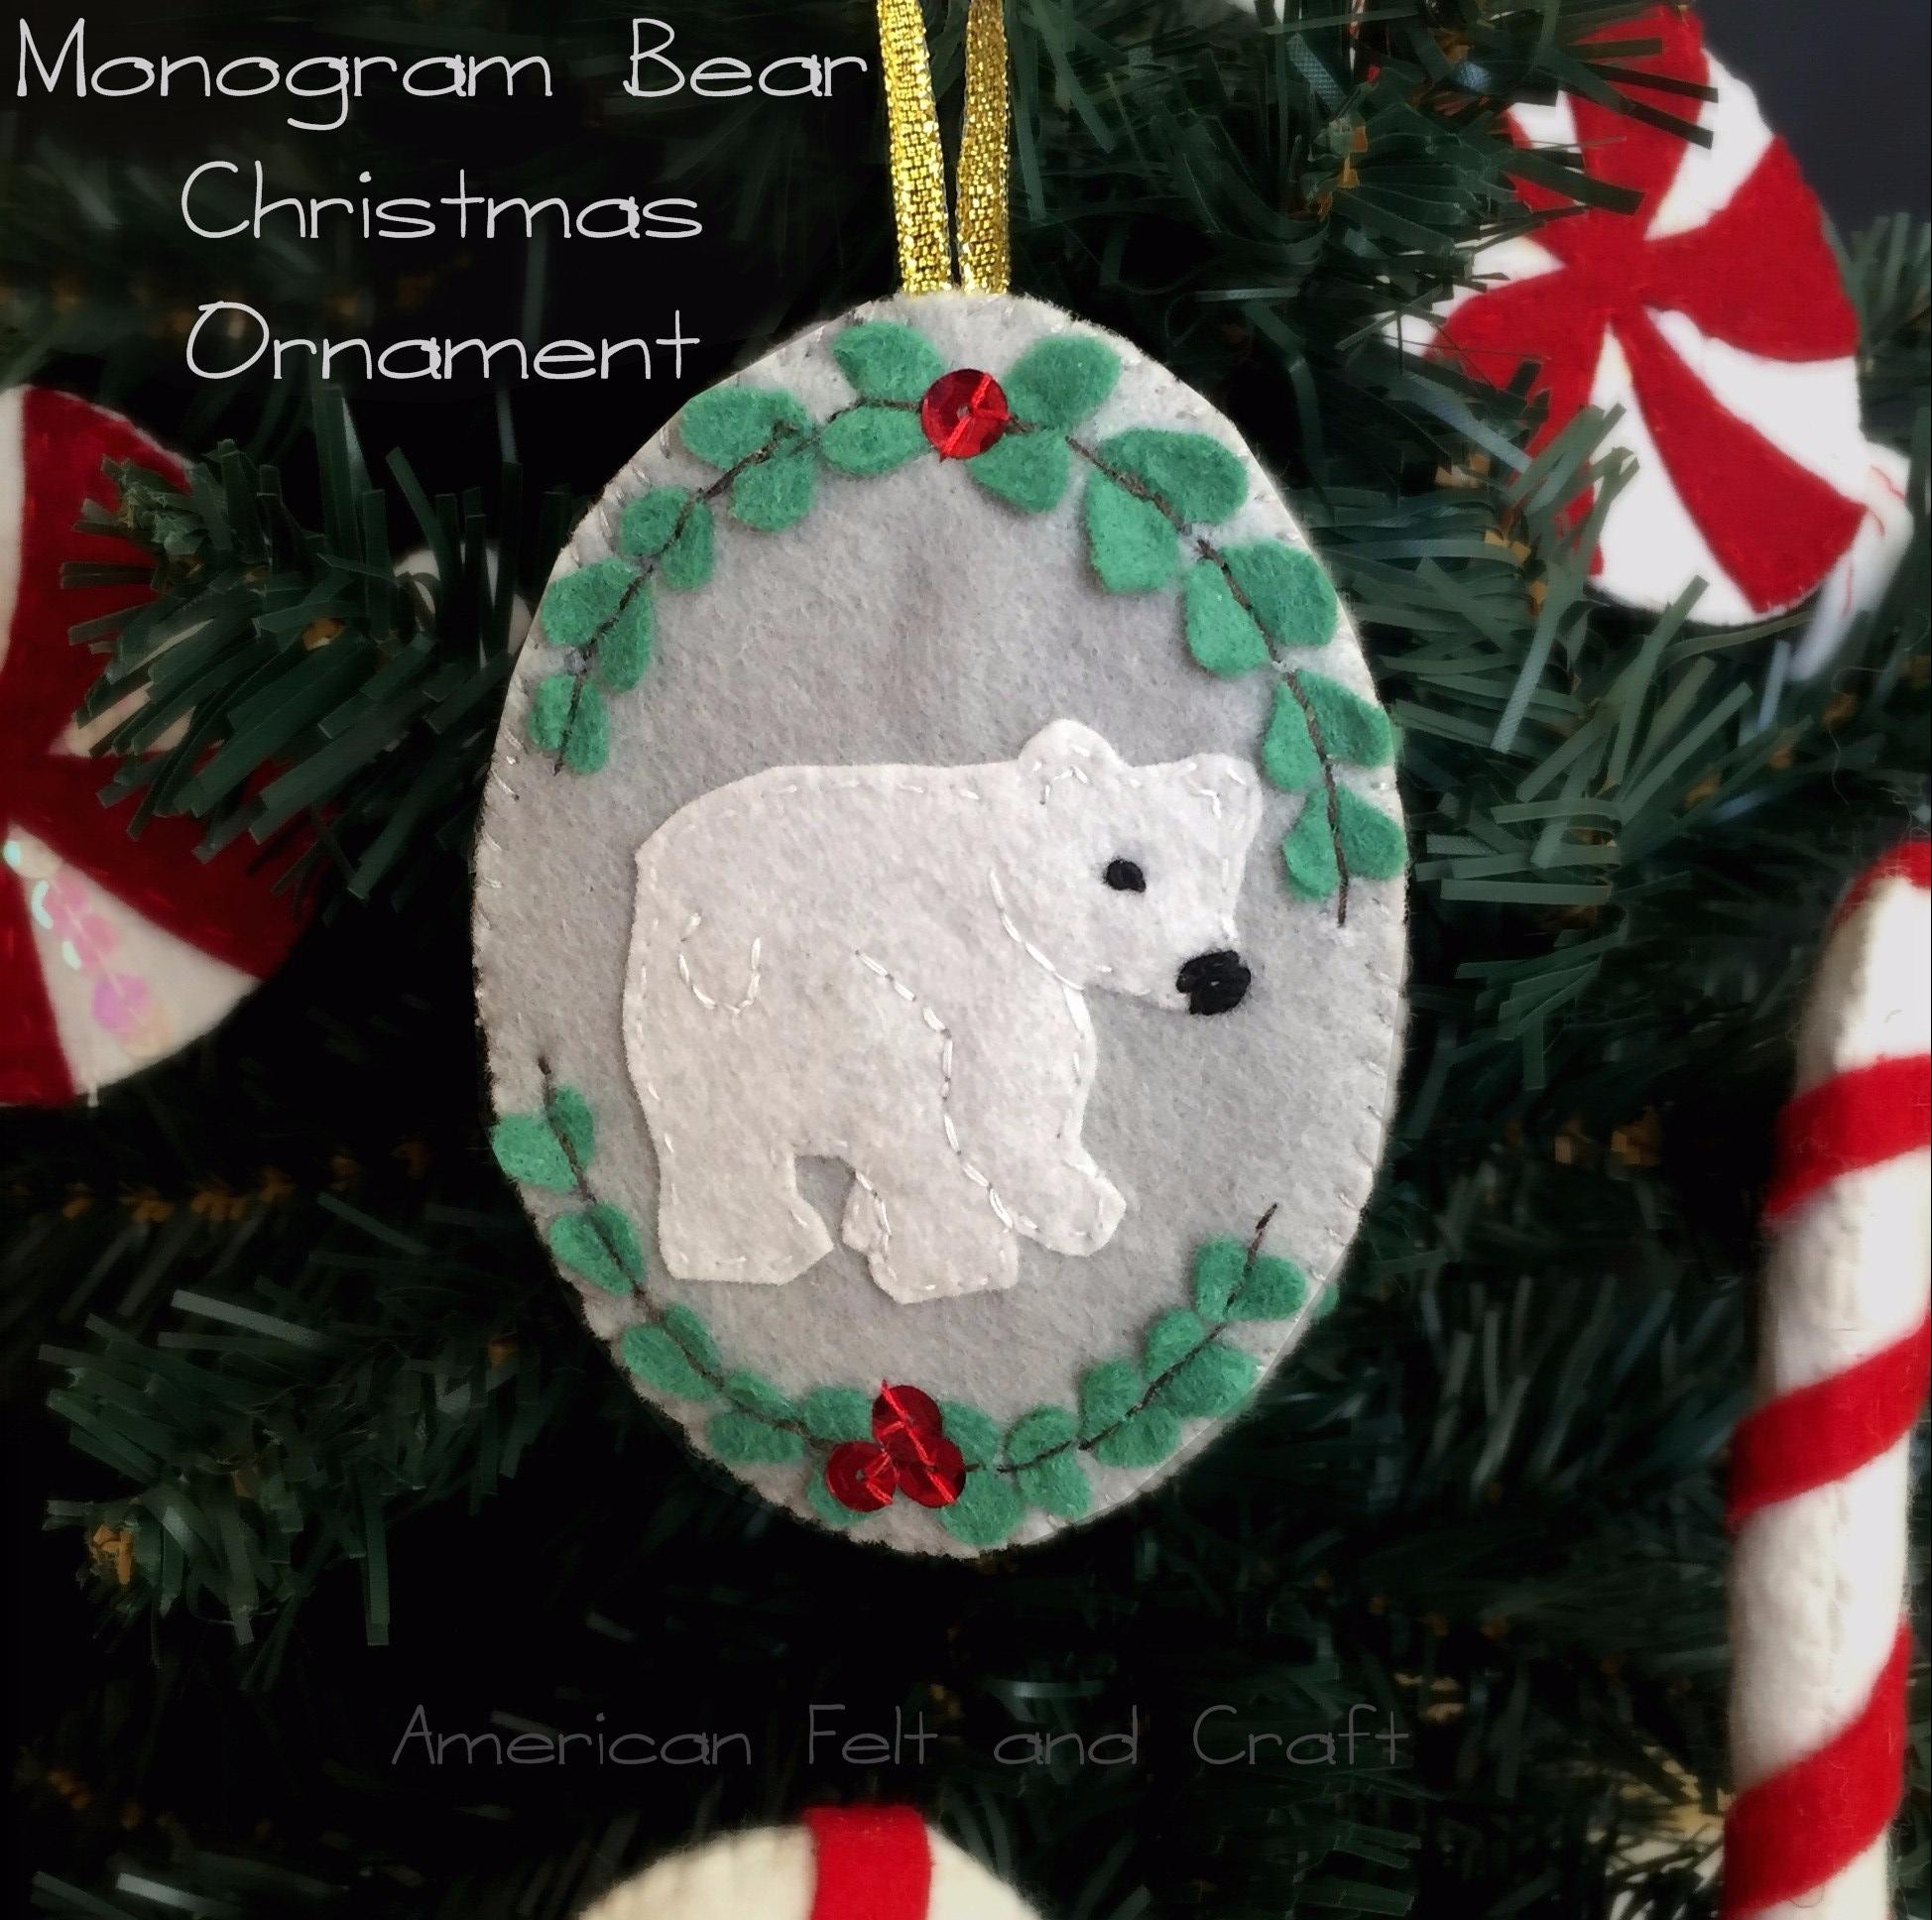 bearchristmasornament